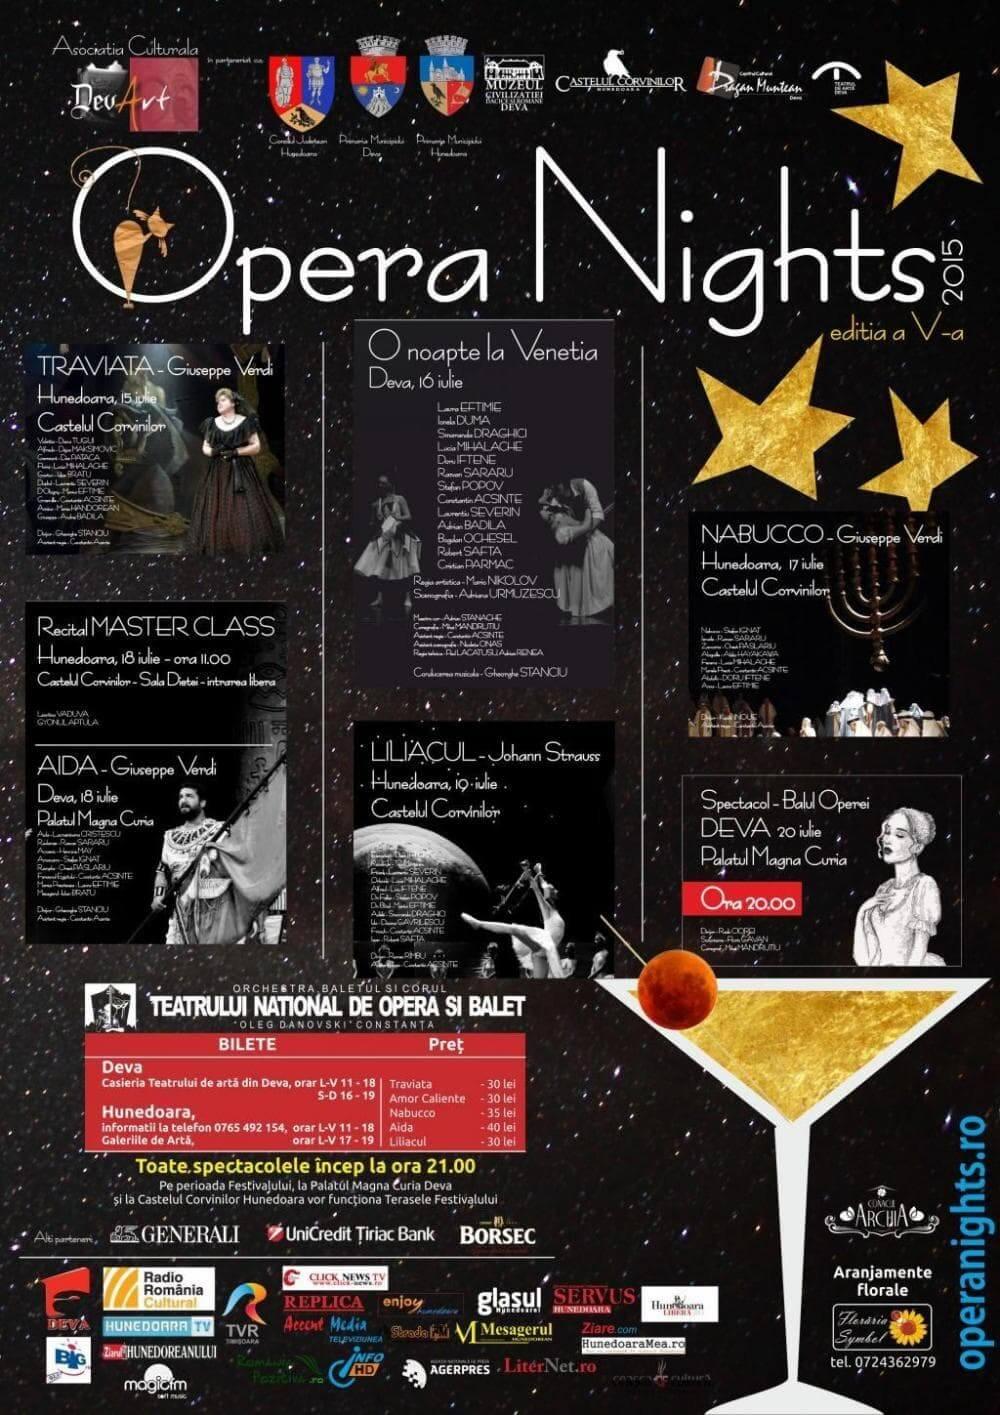 Opera-Nights-2015-hunedoara